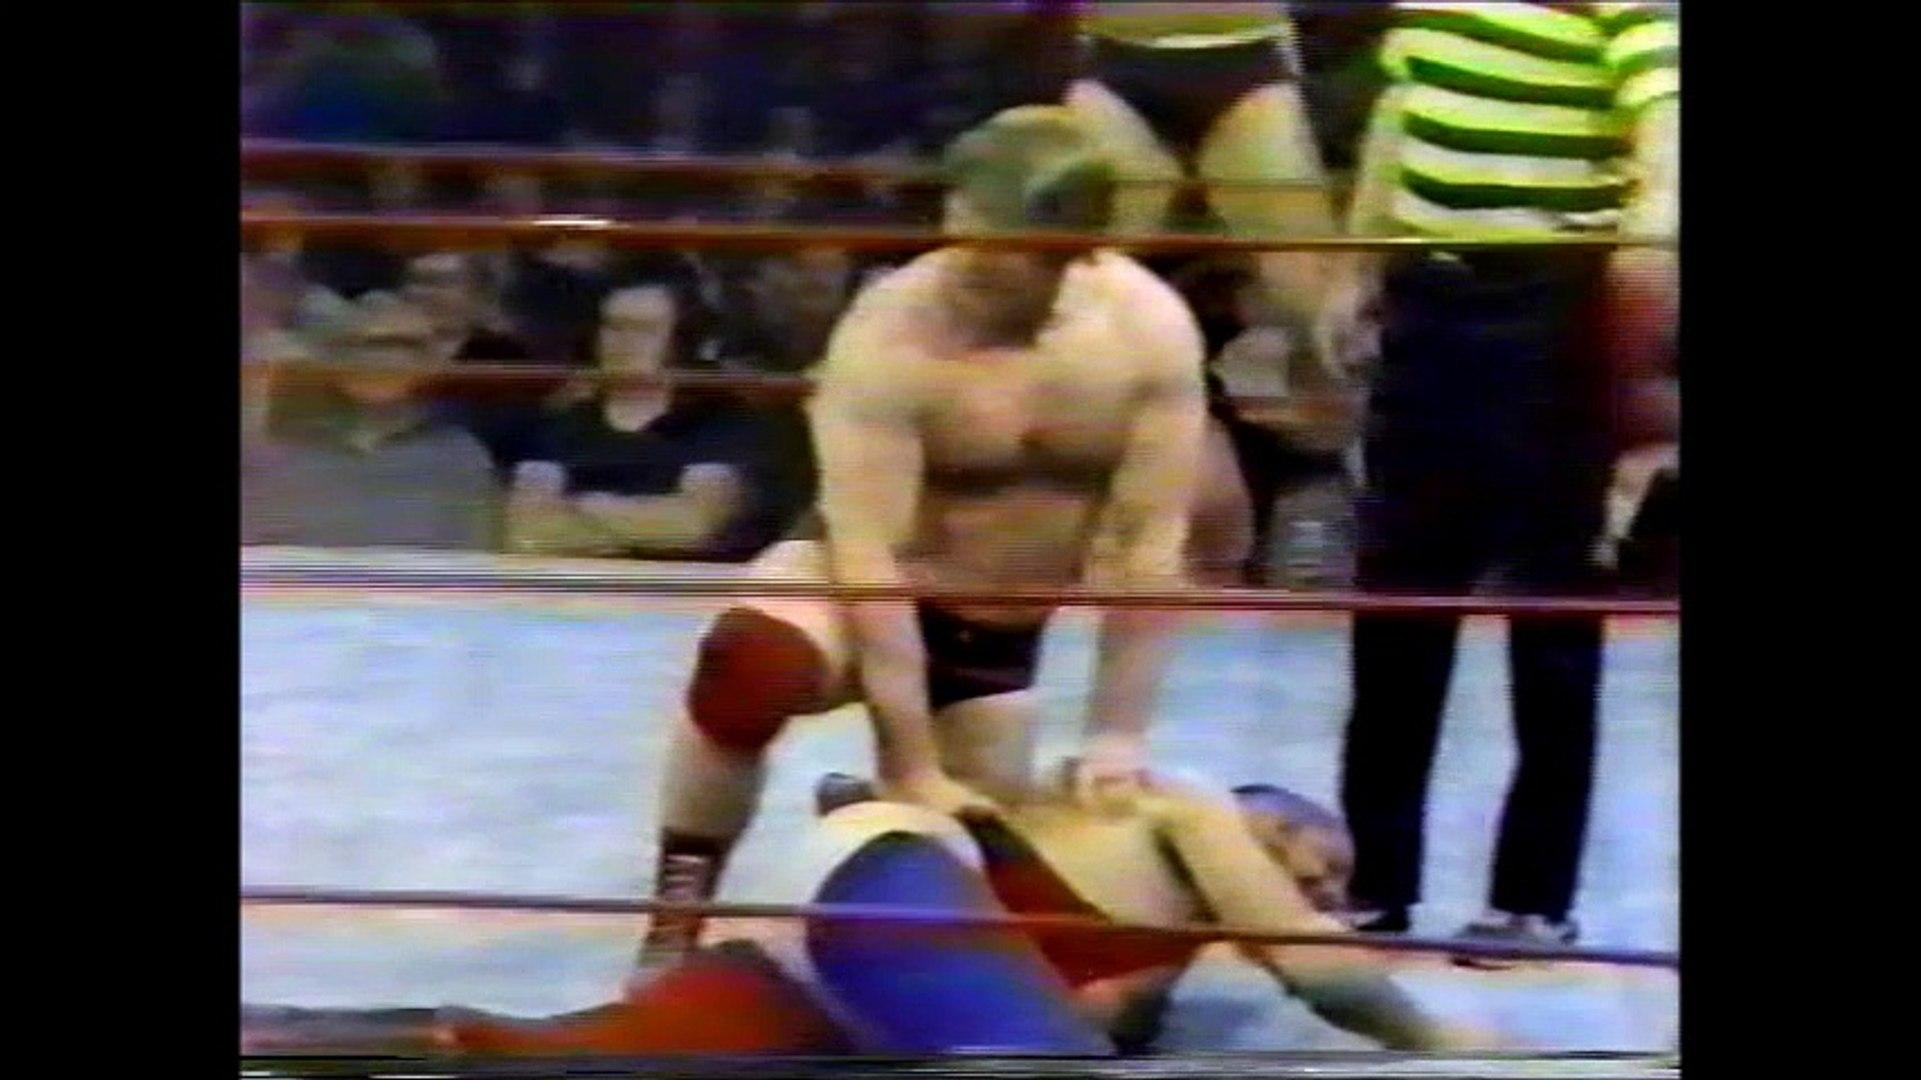 Roddy Piper/Rick Martel vs Butch Miller/Luke Williams (Portland March 8th, 1980)